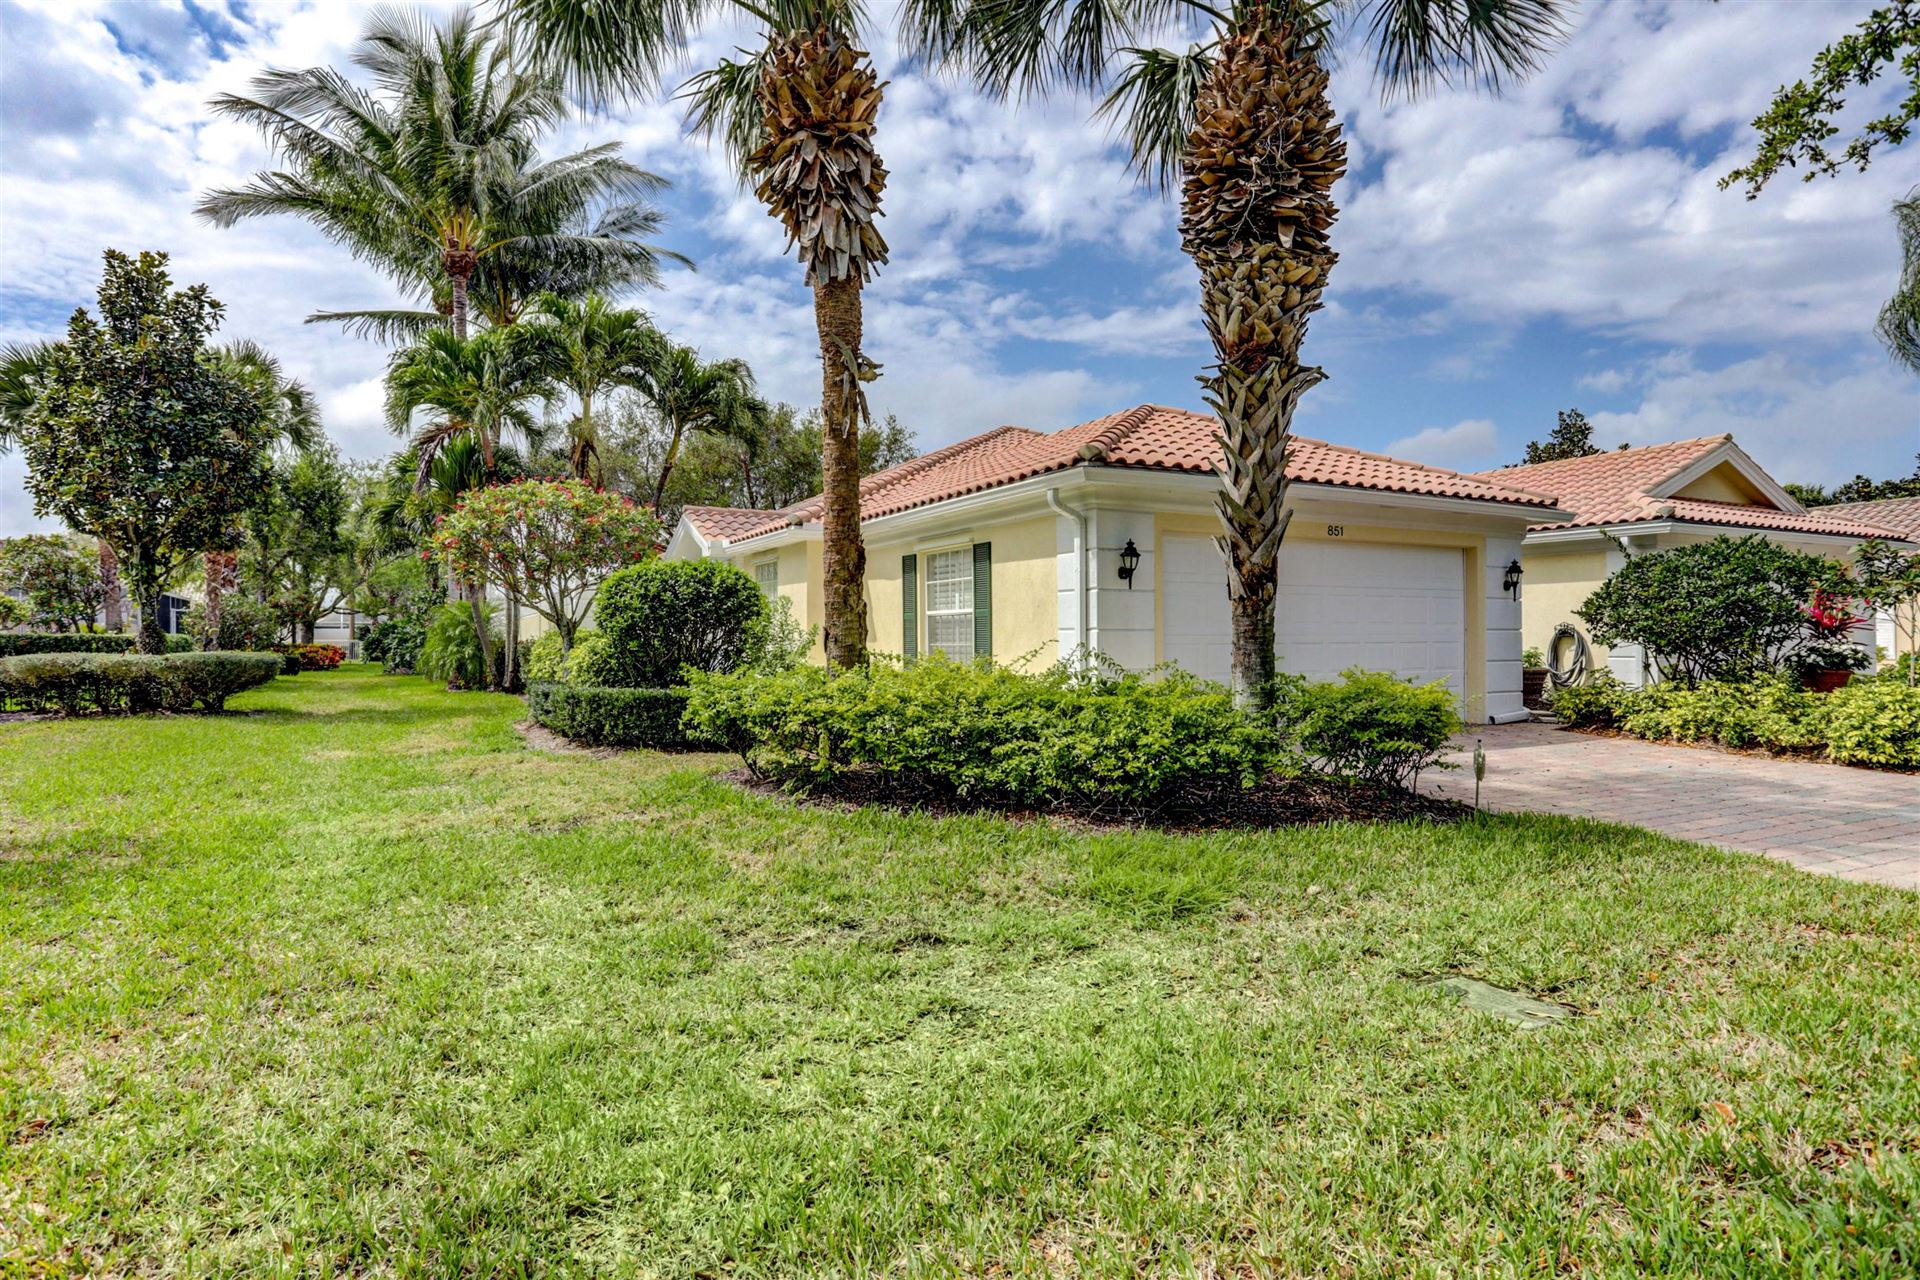 Photo of 851 Niemen Drive, Palm Beach Gardens, FL 33410 (MLS # RX-10697059)